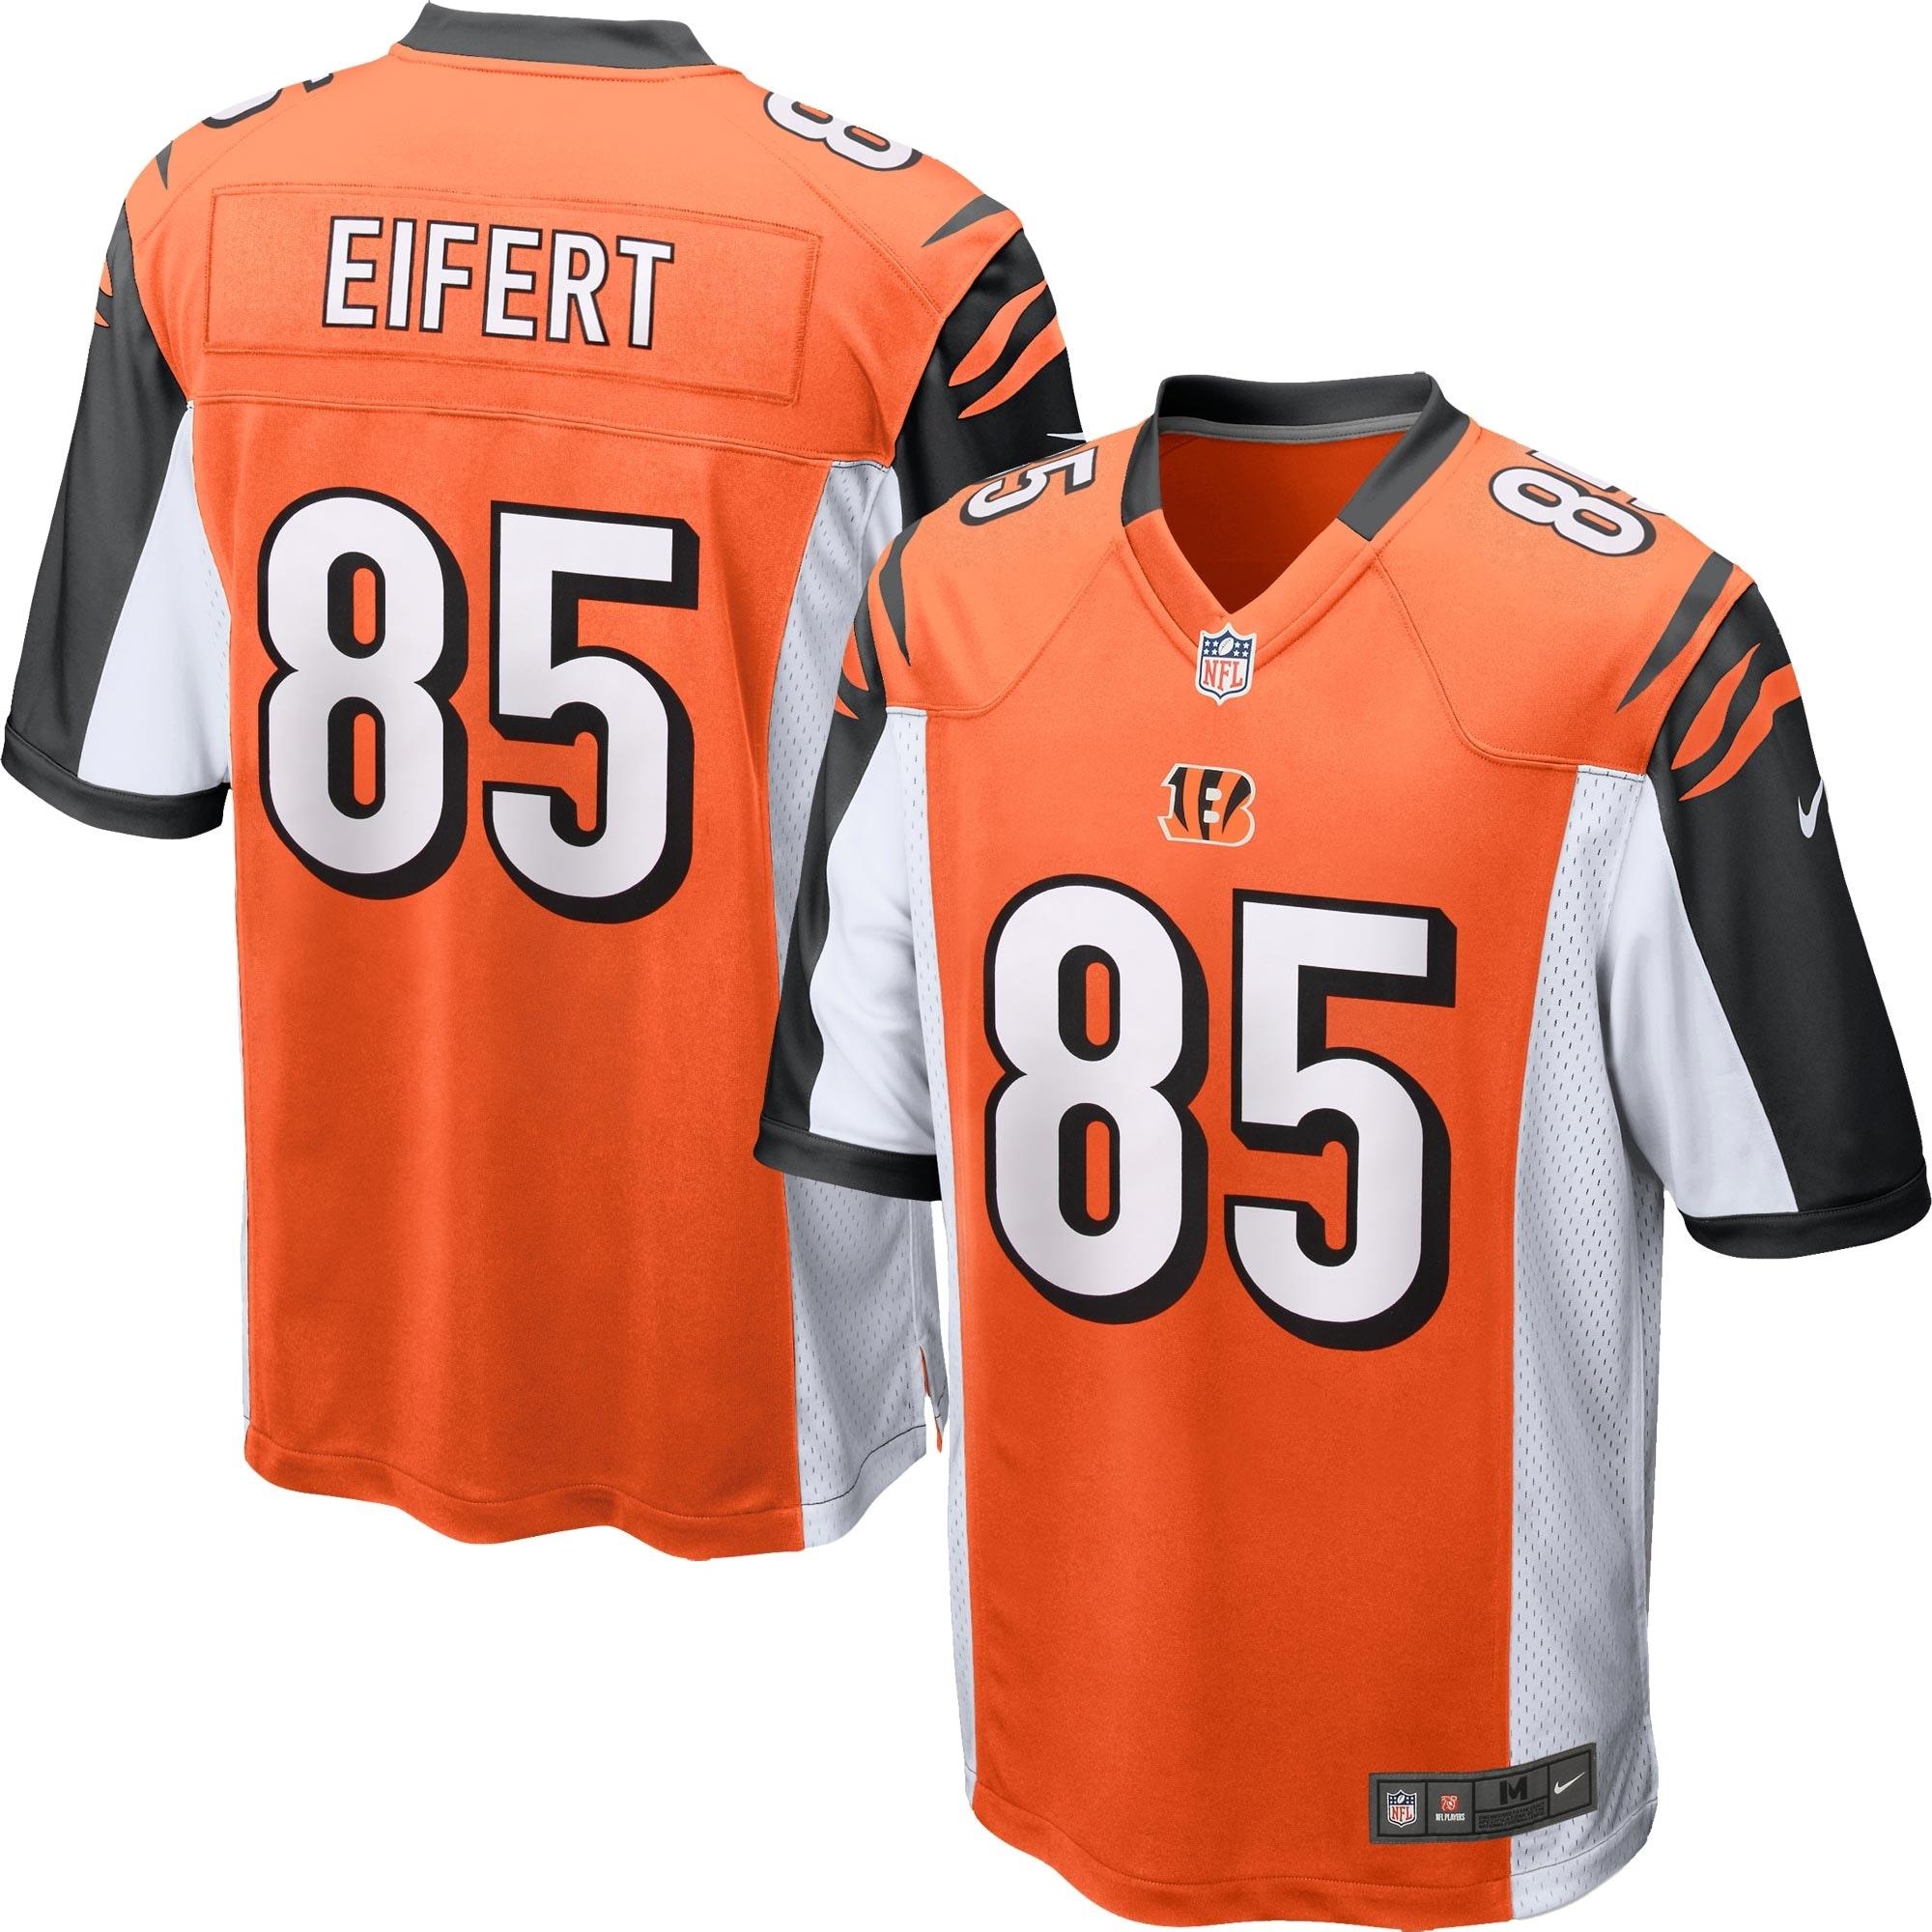 Tyler Eifert Cincinnati Bengals Nike Youth Alternate Game Jersey - Orange - Walmart.com